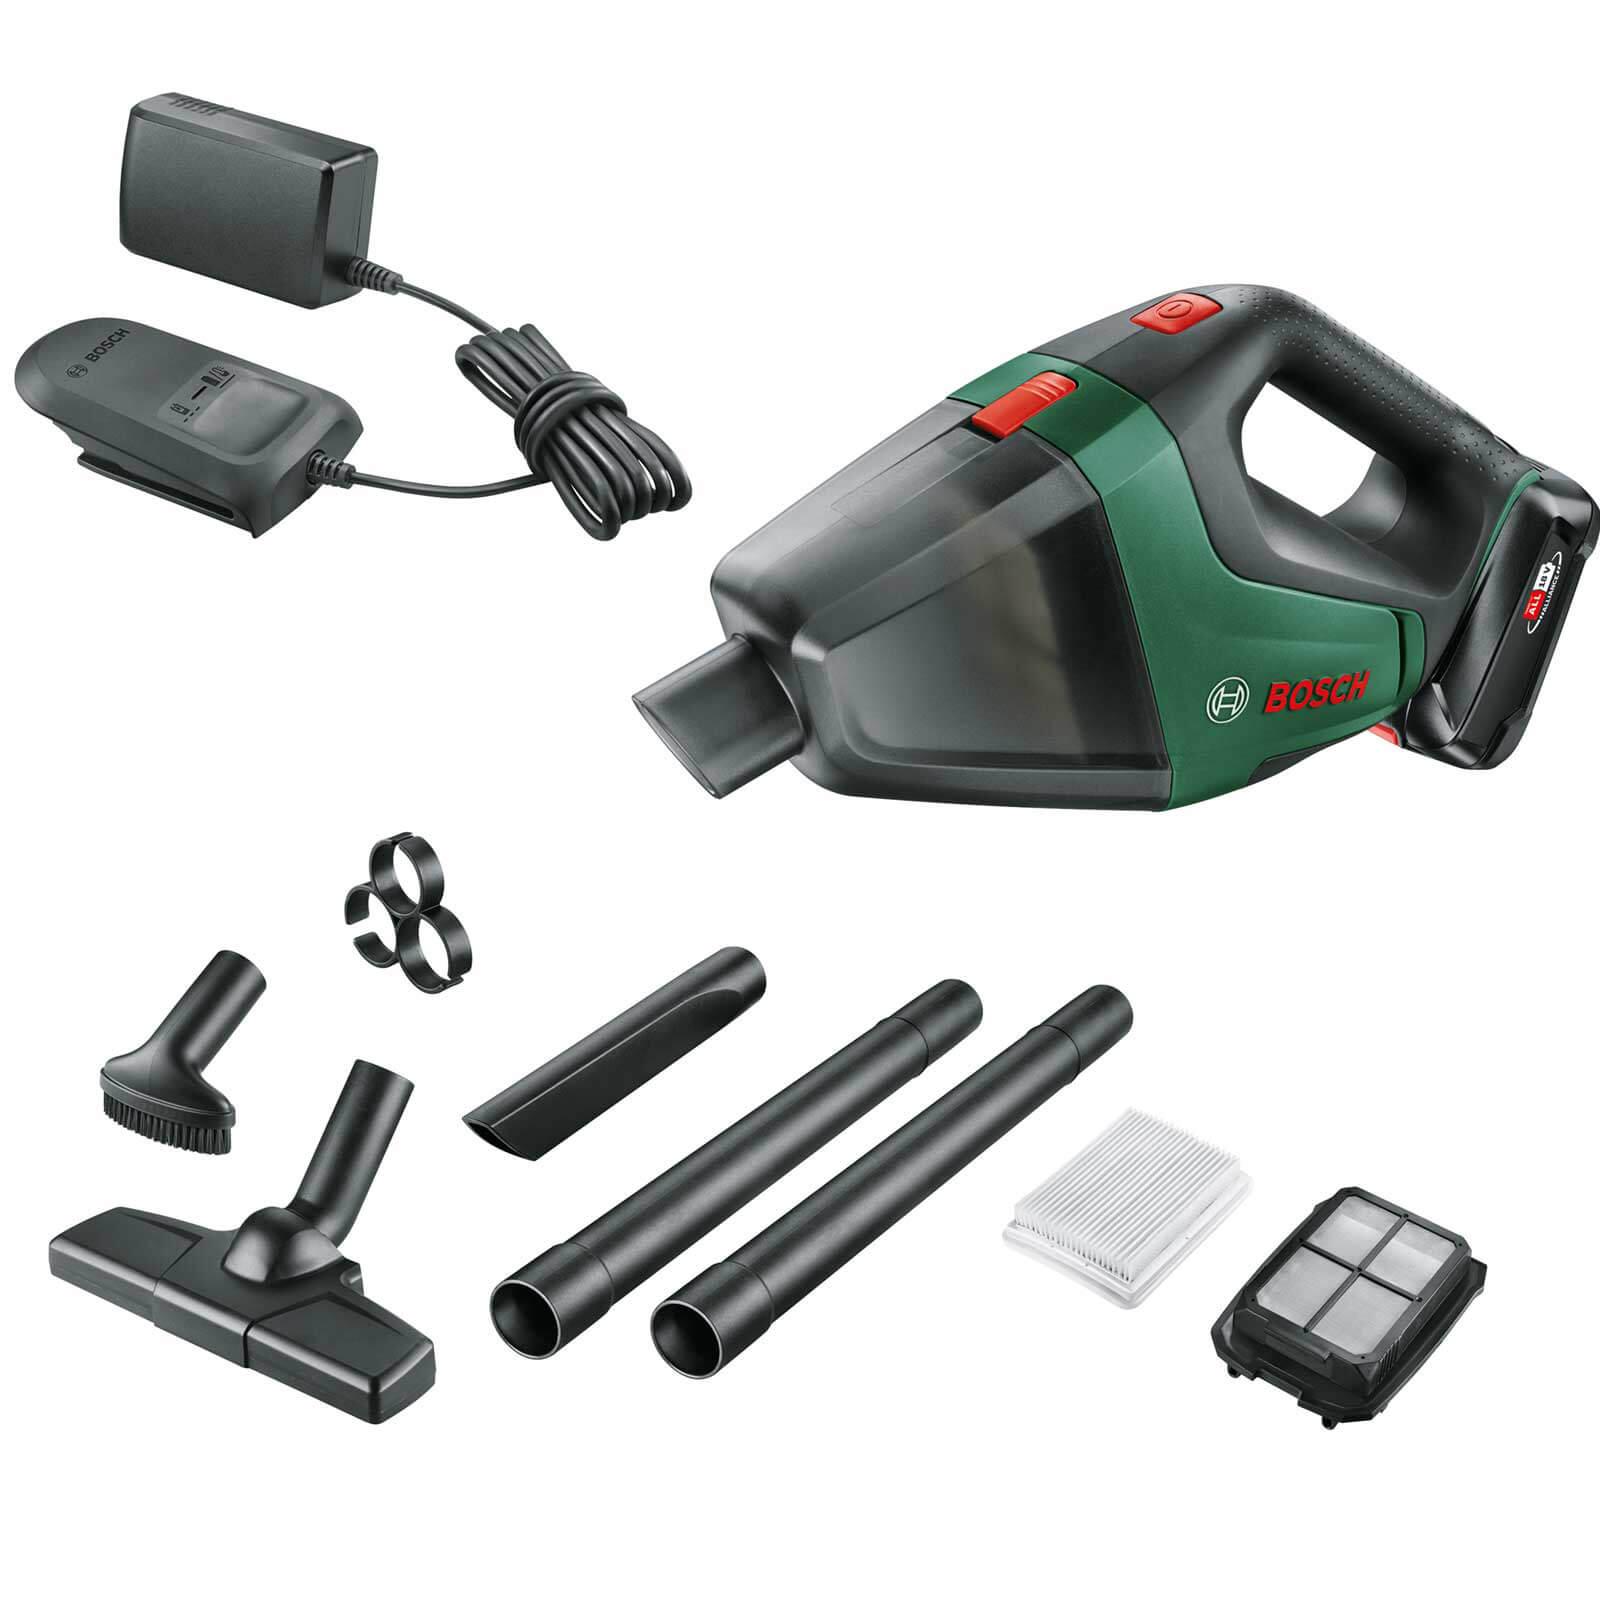 Bosch UNIVERSALVAC 18v Cordless Hand Vacuum Cleaner 1 x 1.5ah Li-ion Charger No Case